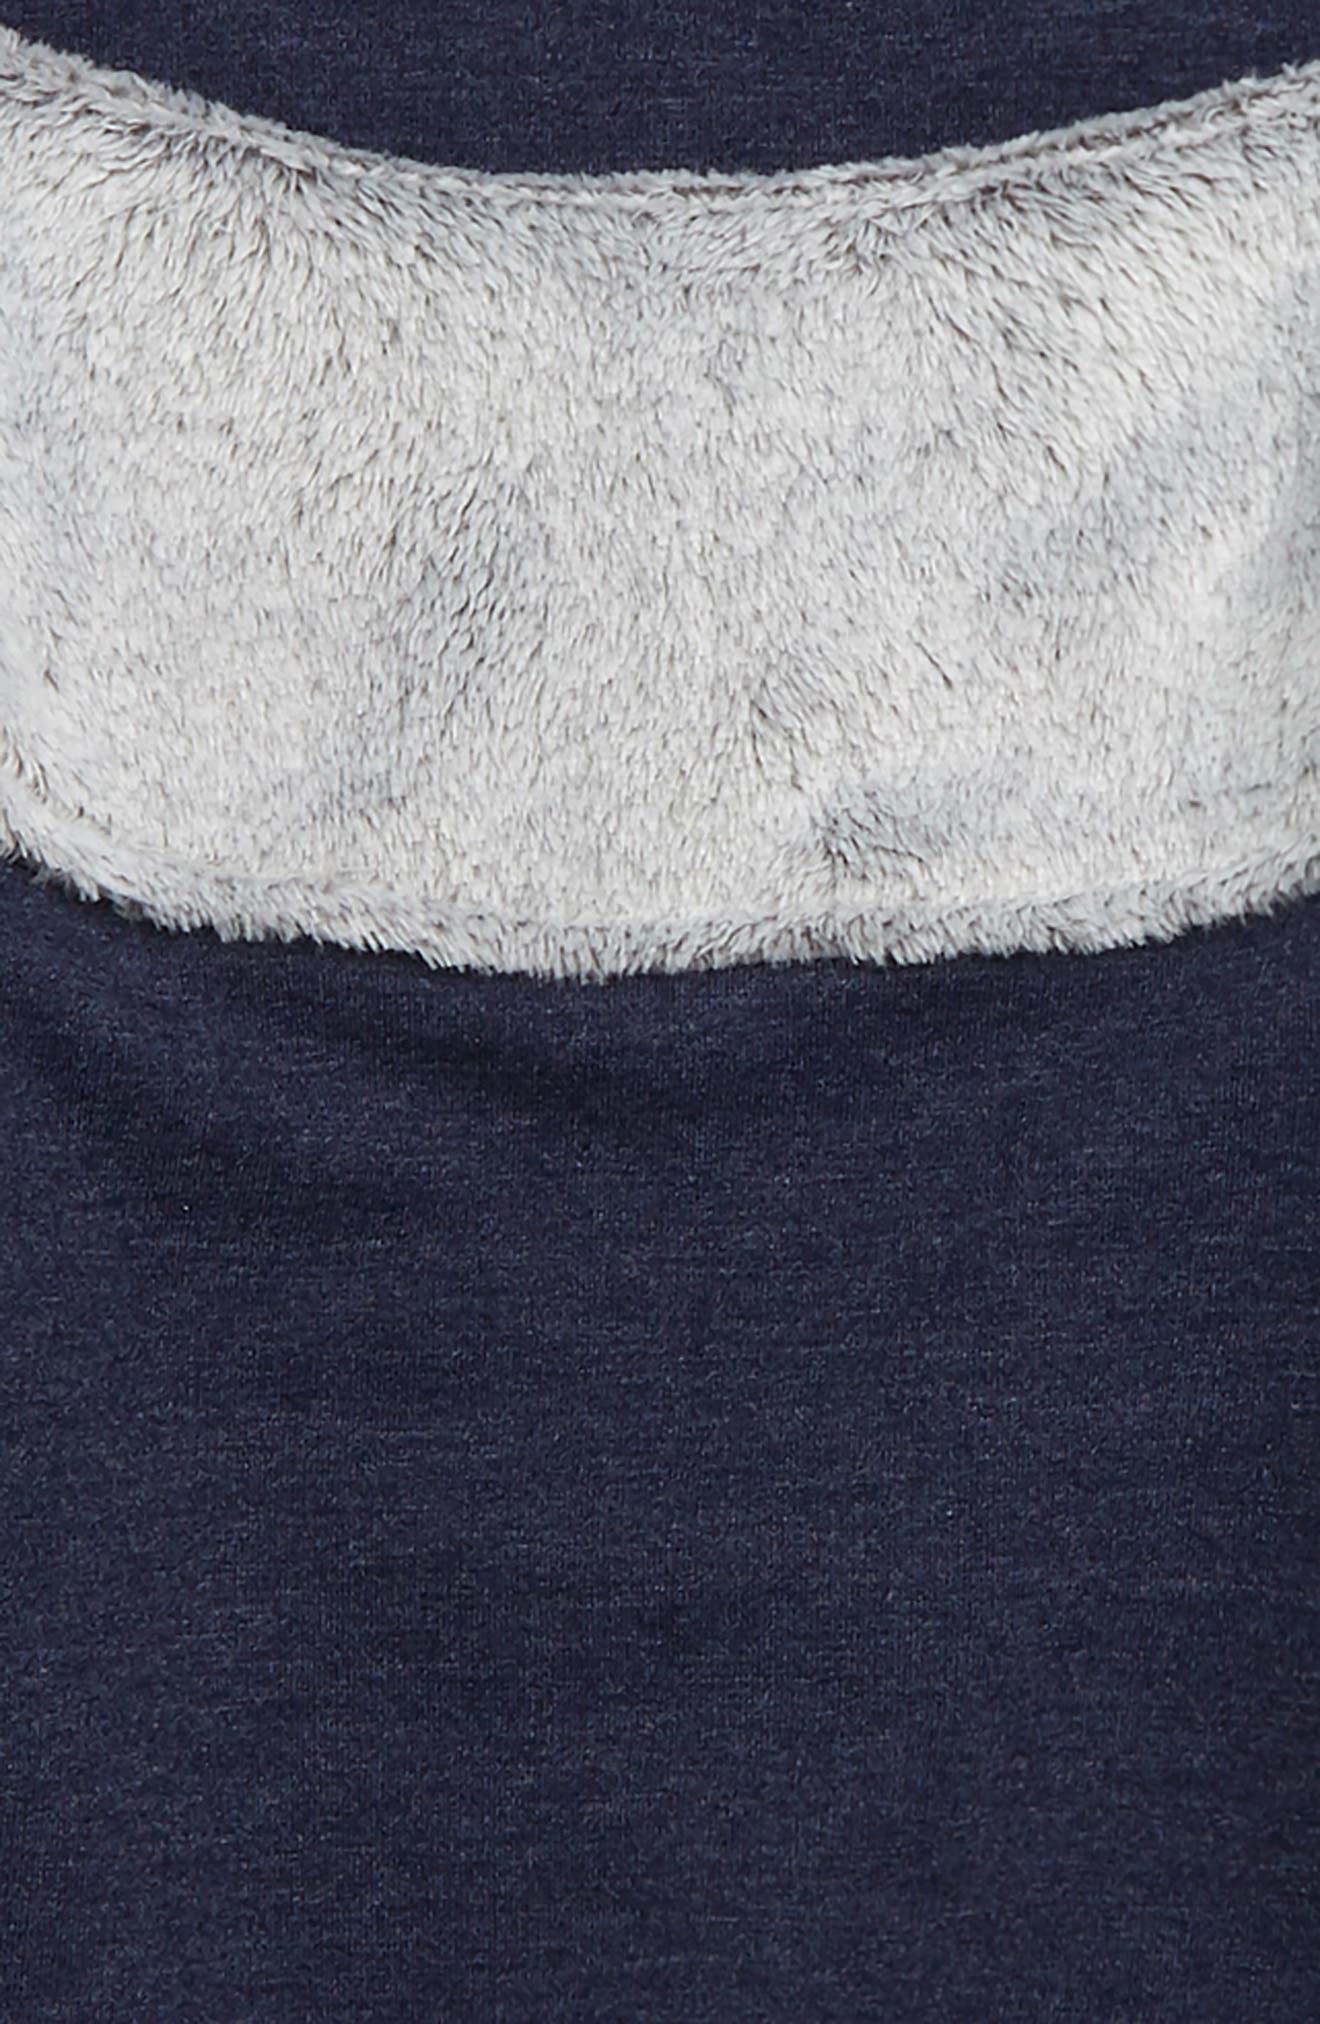 ZELLA GIRL, Sporty Stripe Fleece Sweatshirt, Alternate thumbnail 2, color, 410